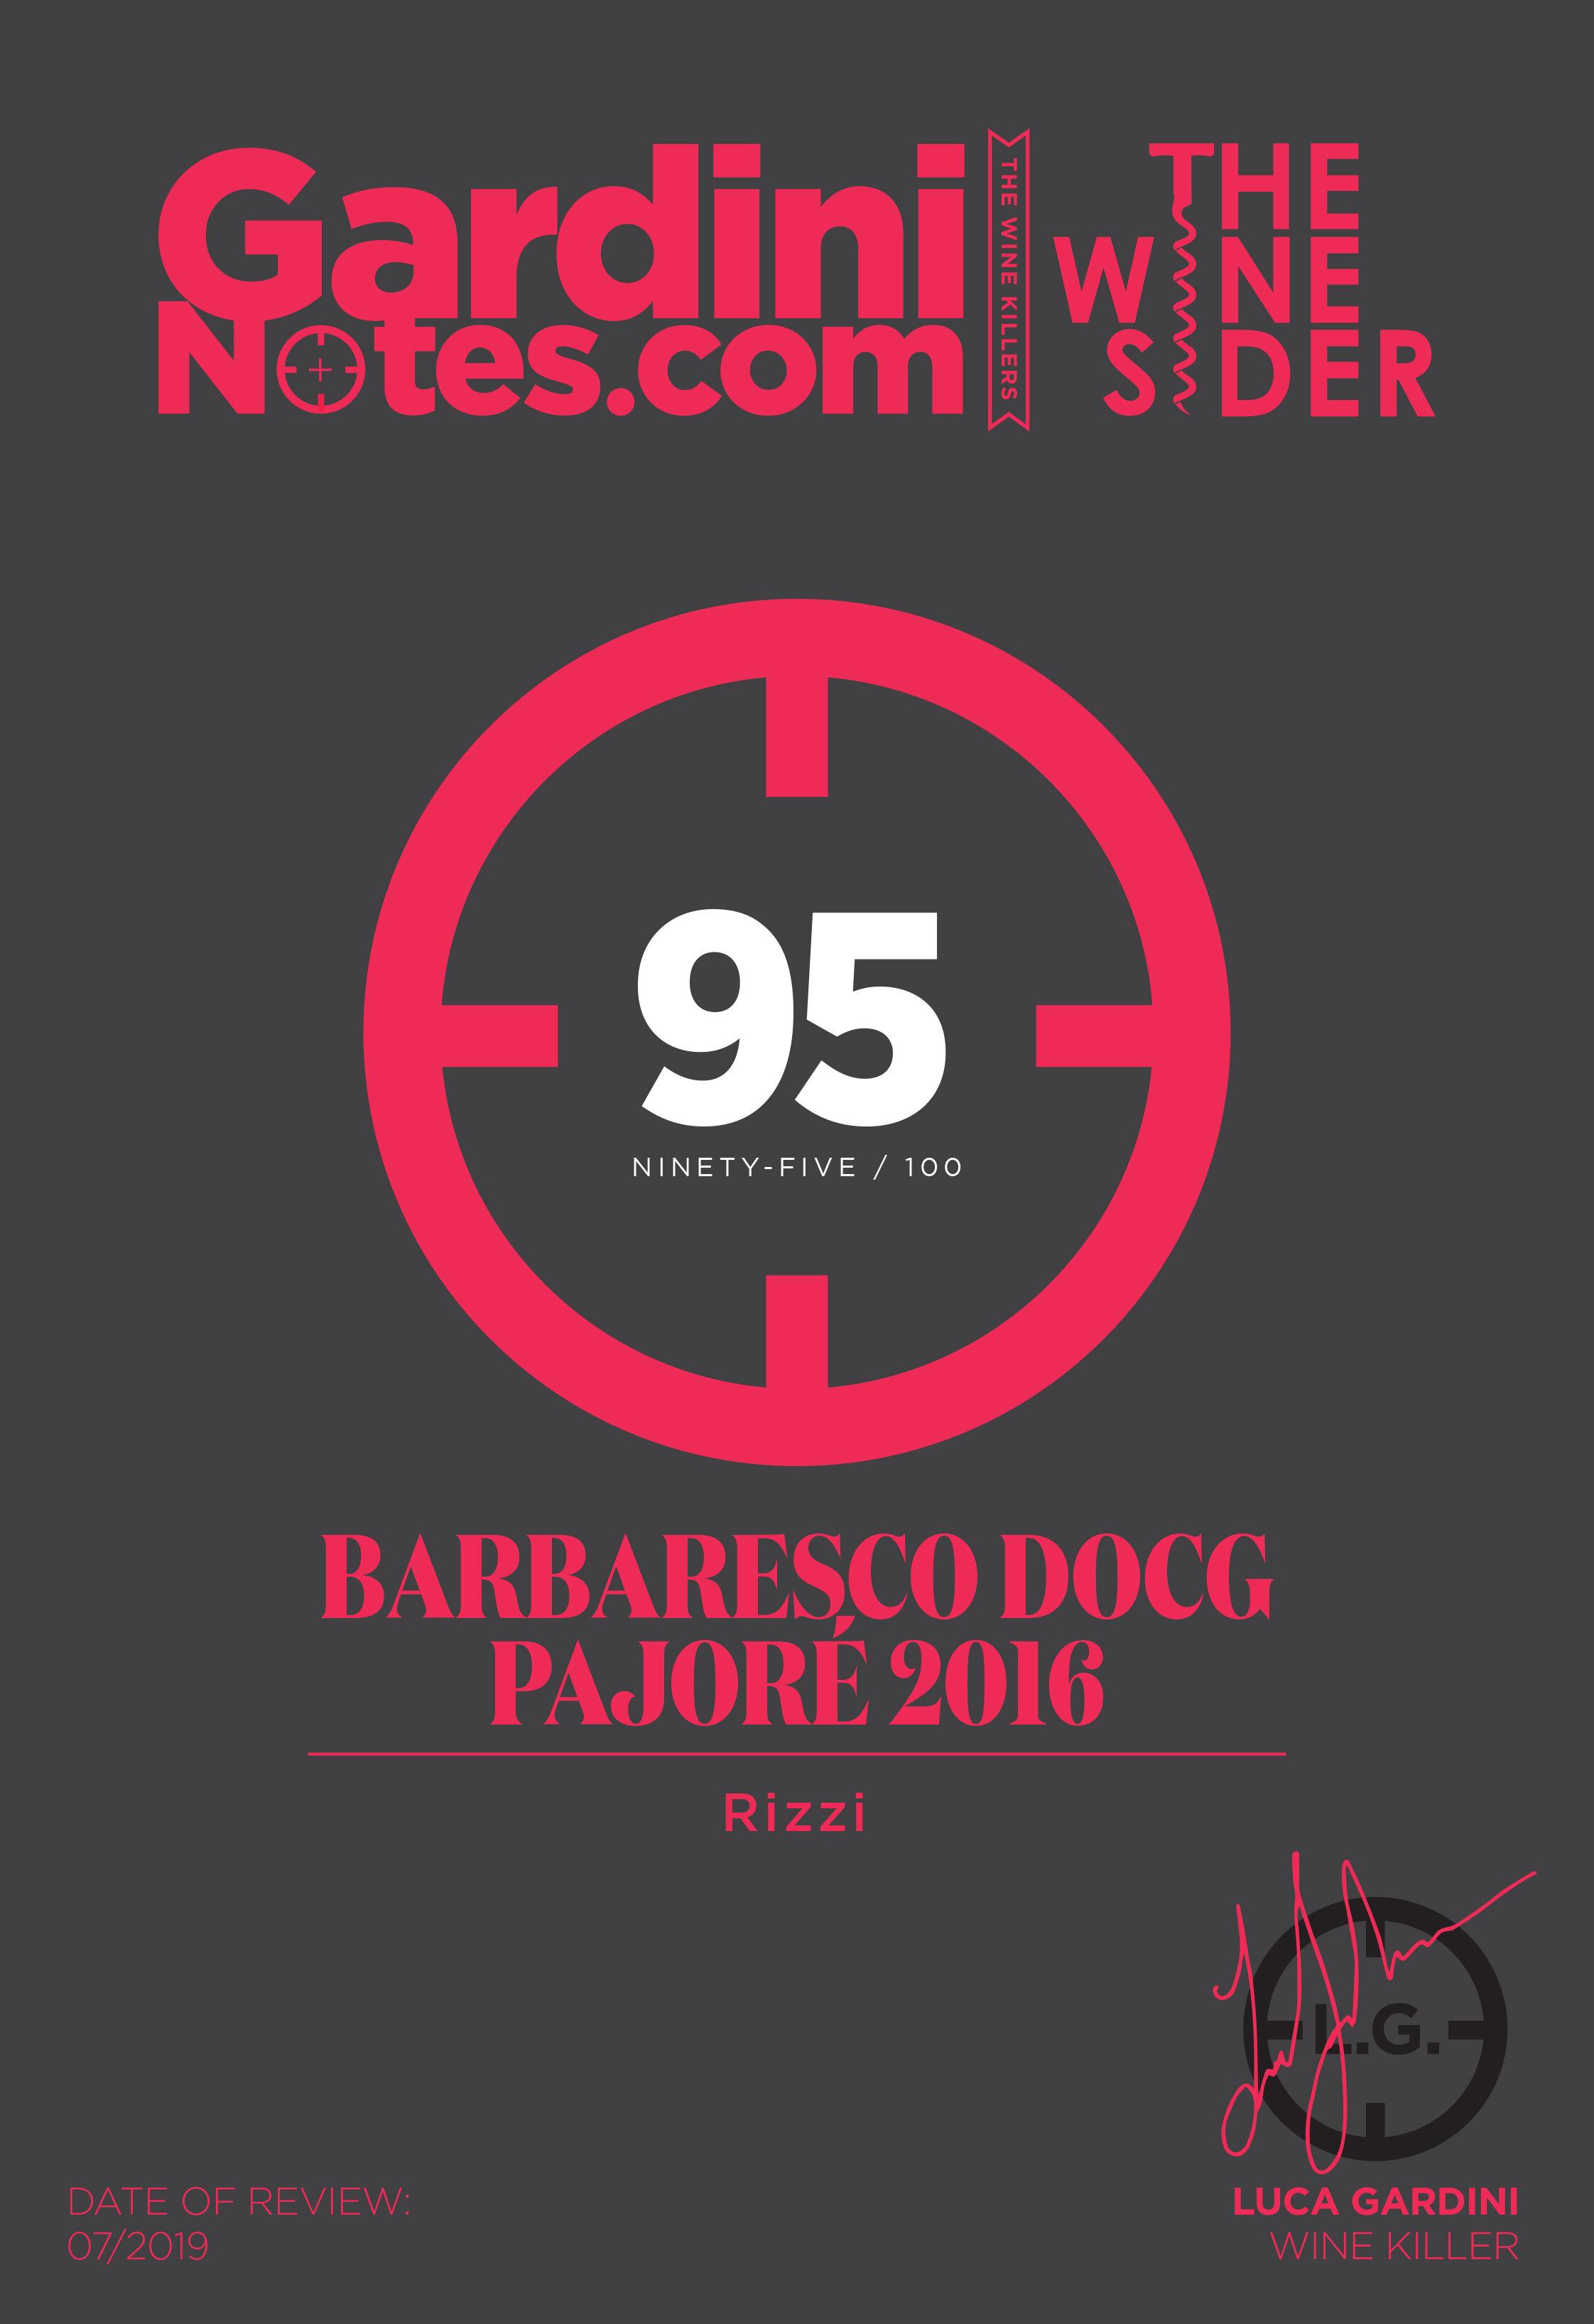 Gardini Notes Barbaresco Rizzi pajorè 2016 punteggio 95.jpg